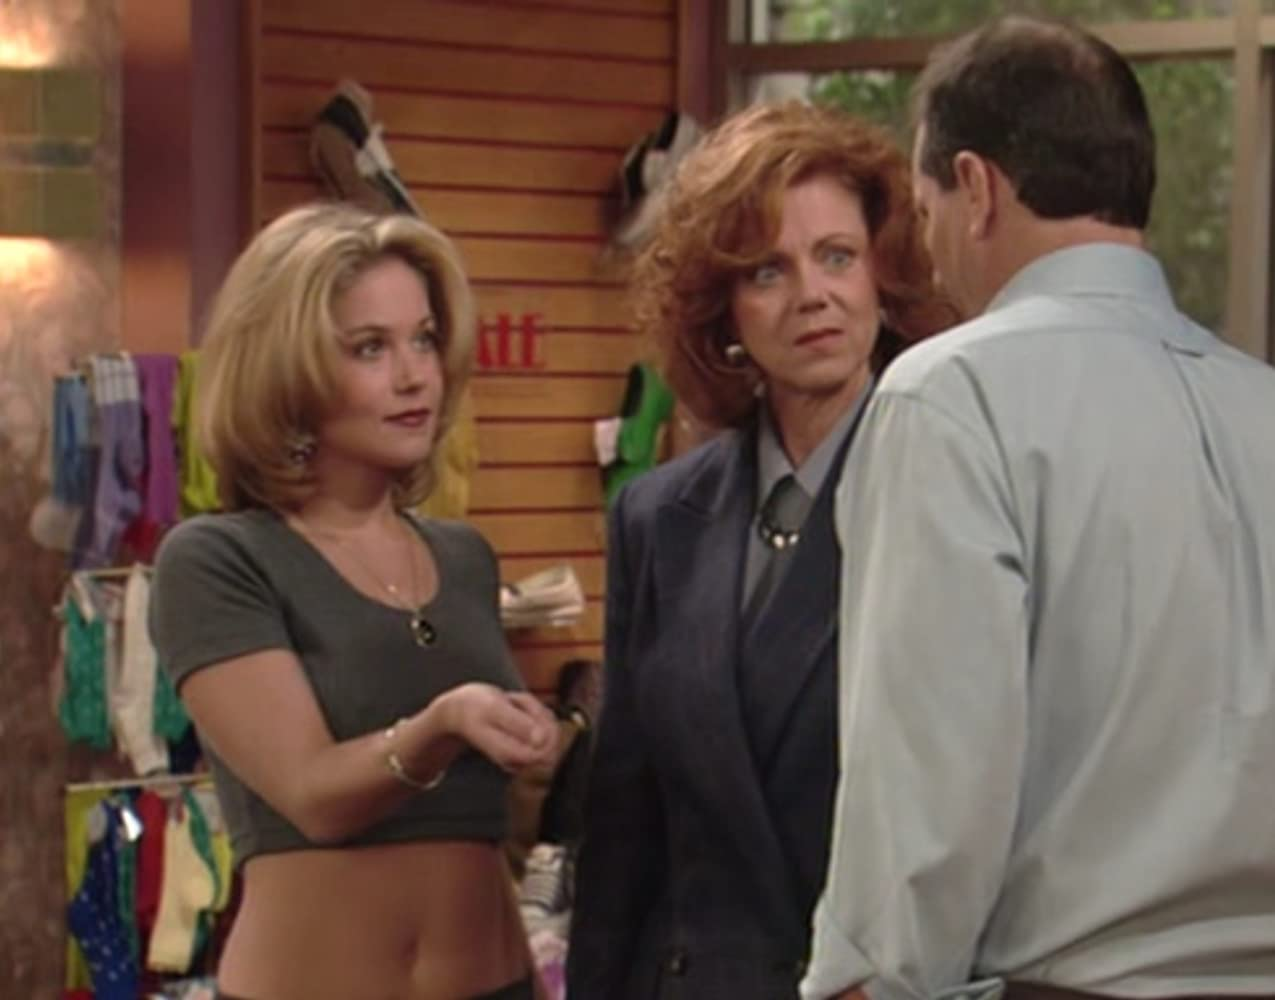 Betsy Randle XXX clips Elizabeth Hurley (born 1965),Victoria Carroll